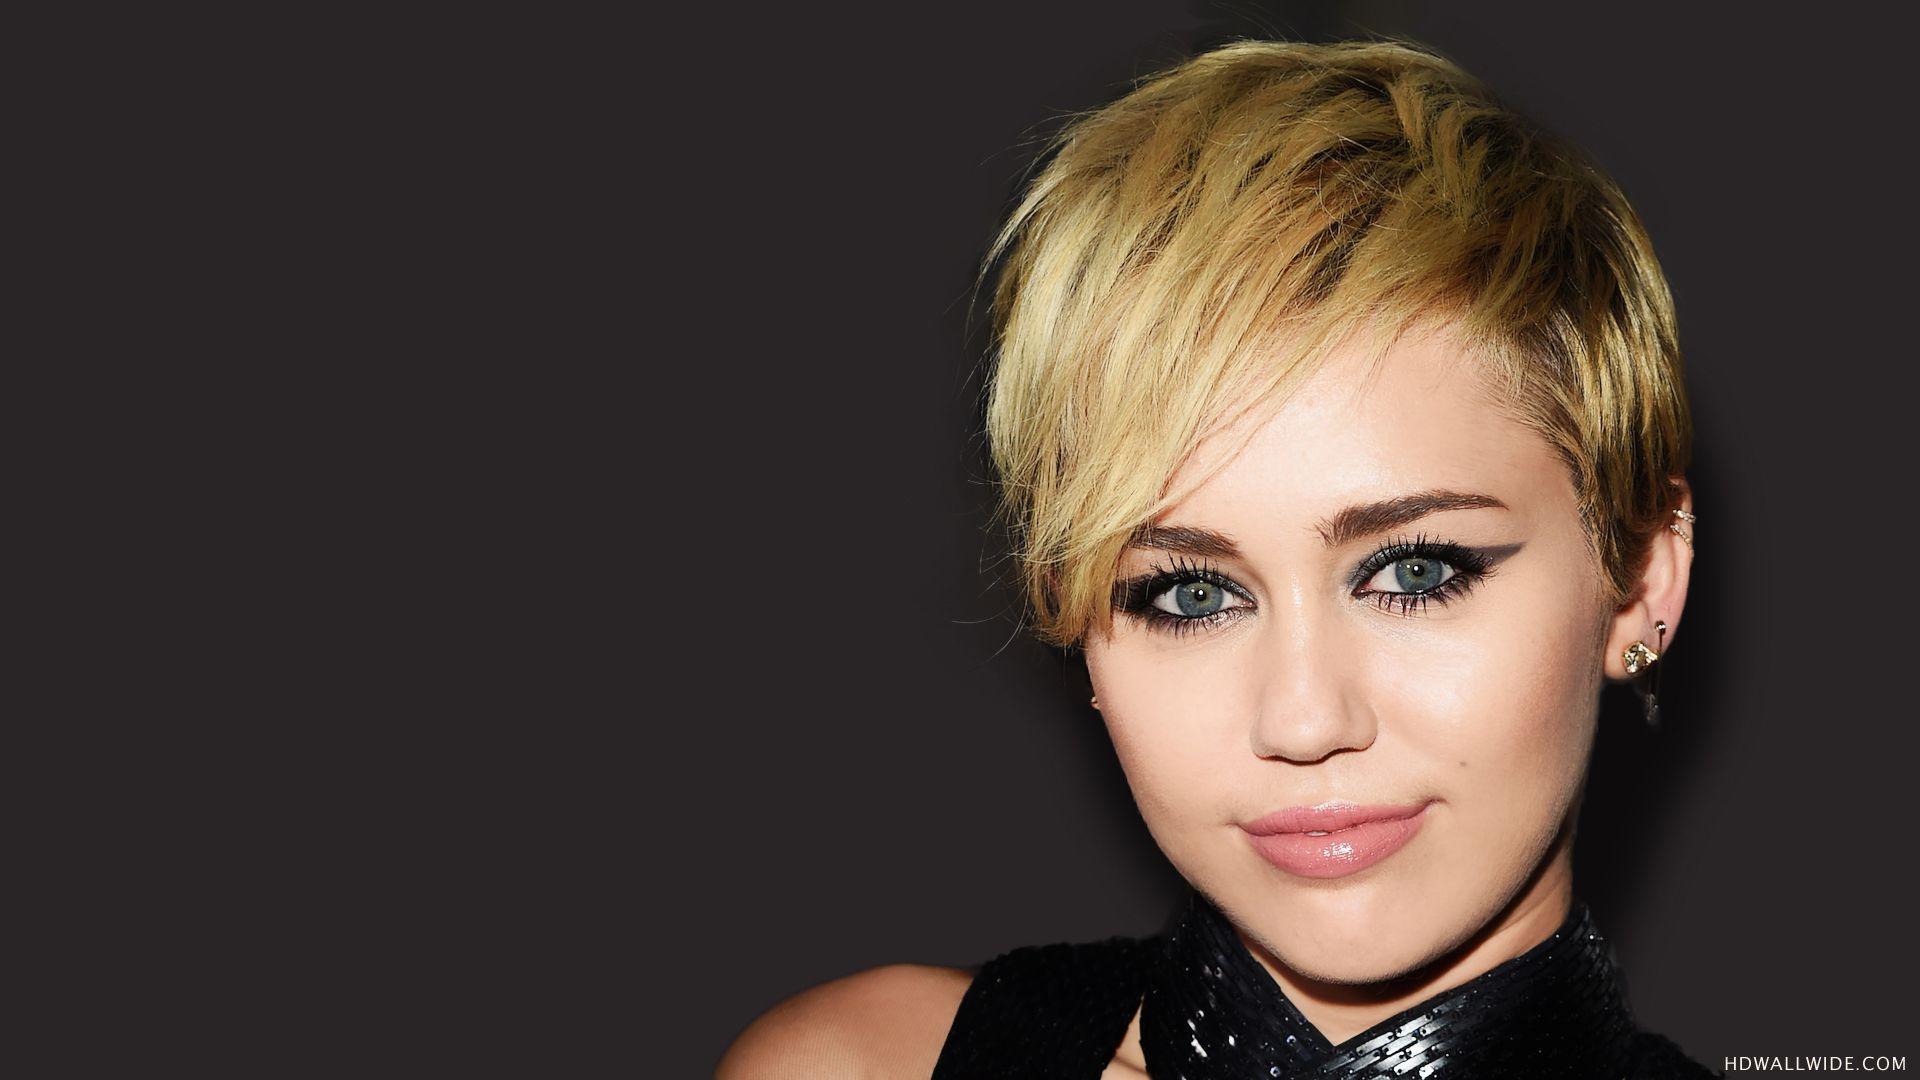 Hd wallpaper upload - Miley Cyrus Wallpaper Miley Cyrus Hd Pictures Hd Wallpaper Upload At